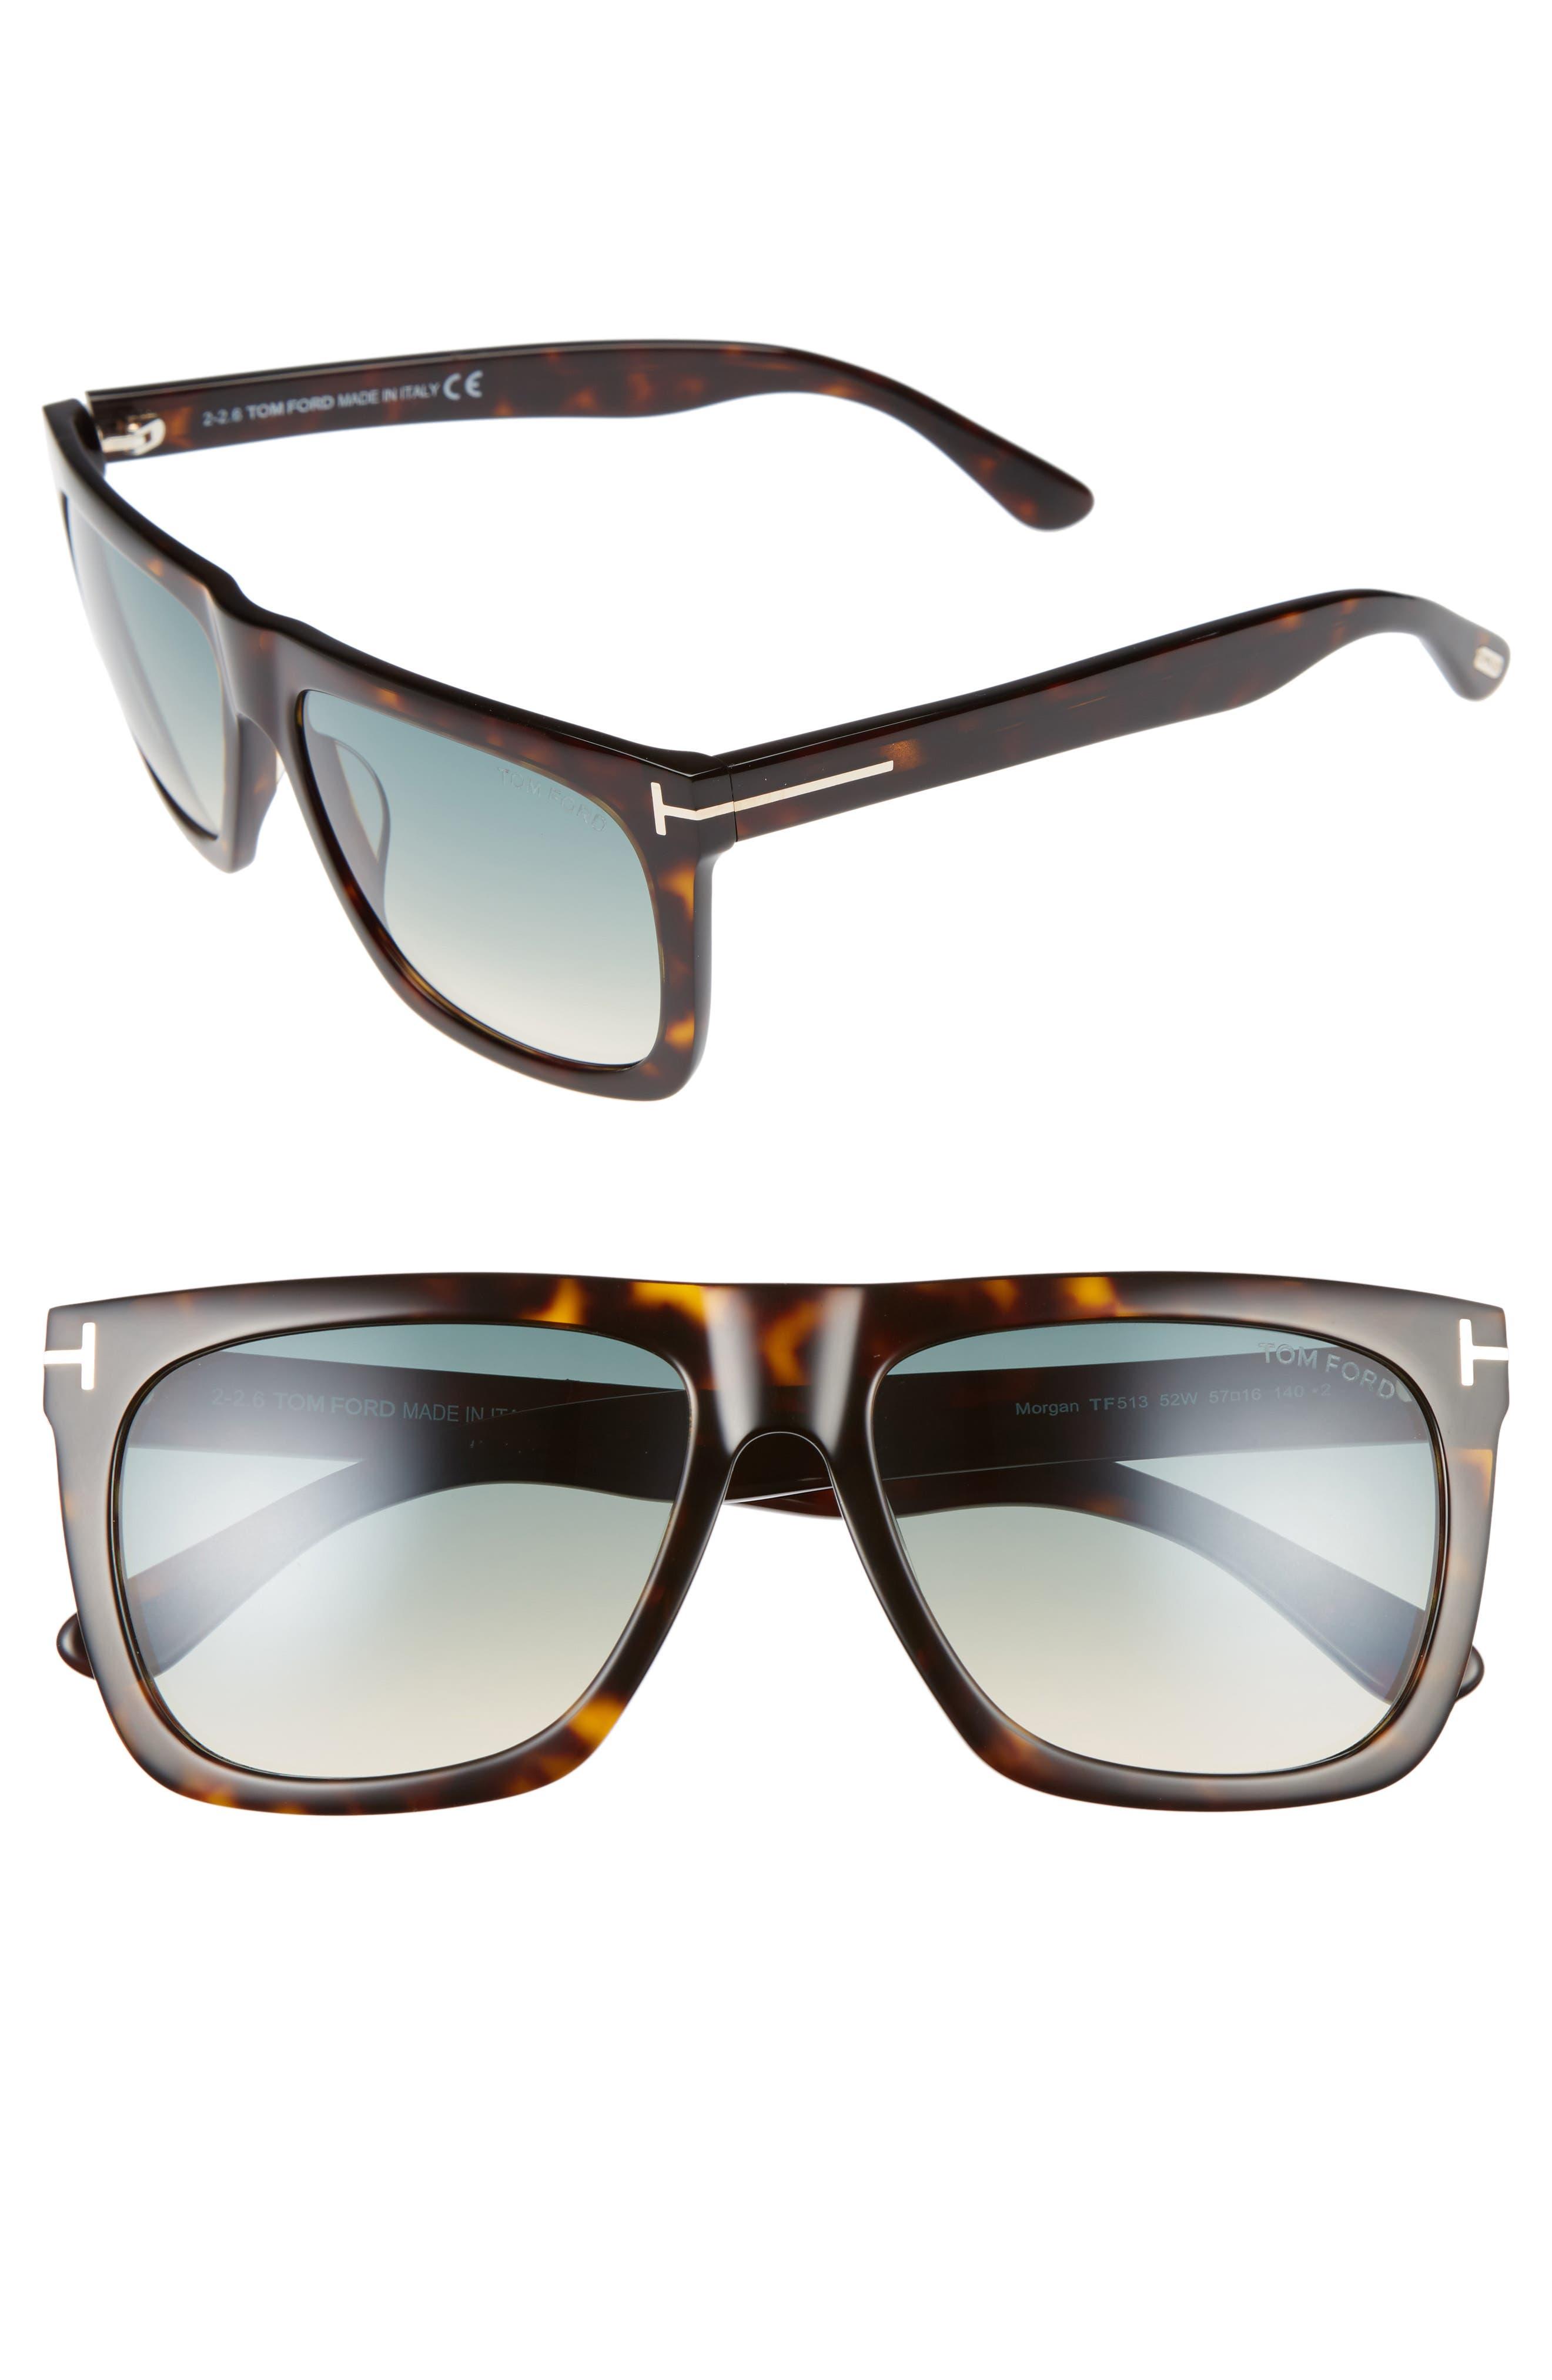 Morgan 57mm Flat Top Sunglasses,                             Main thumbnail 1, color,                             HAVANA/ TURQUOISE GRADIENT